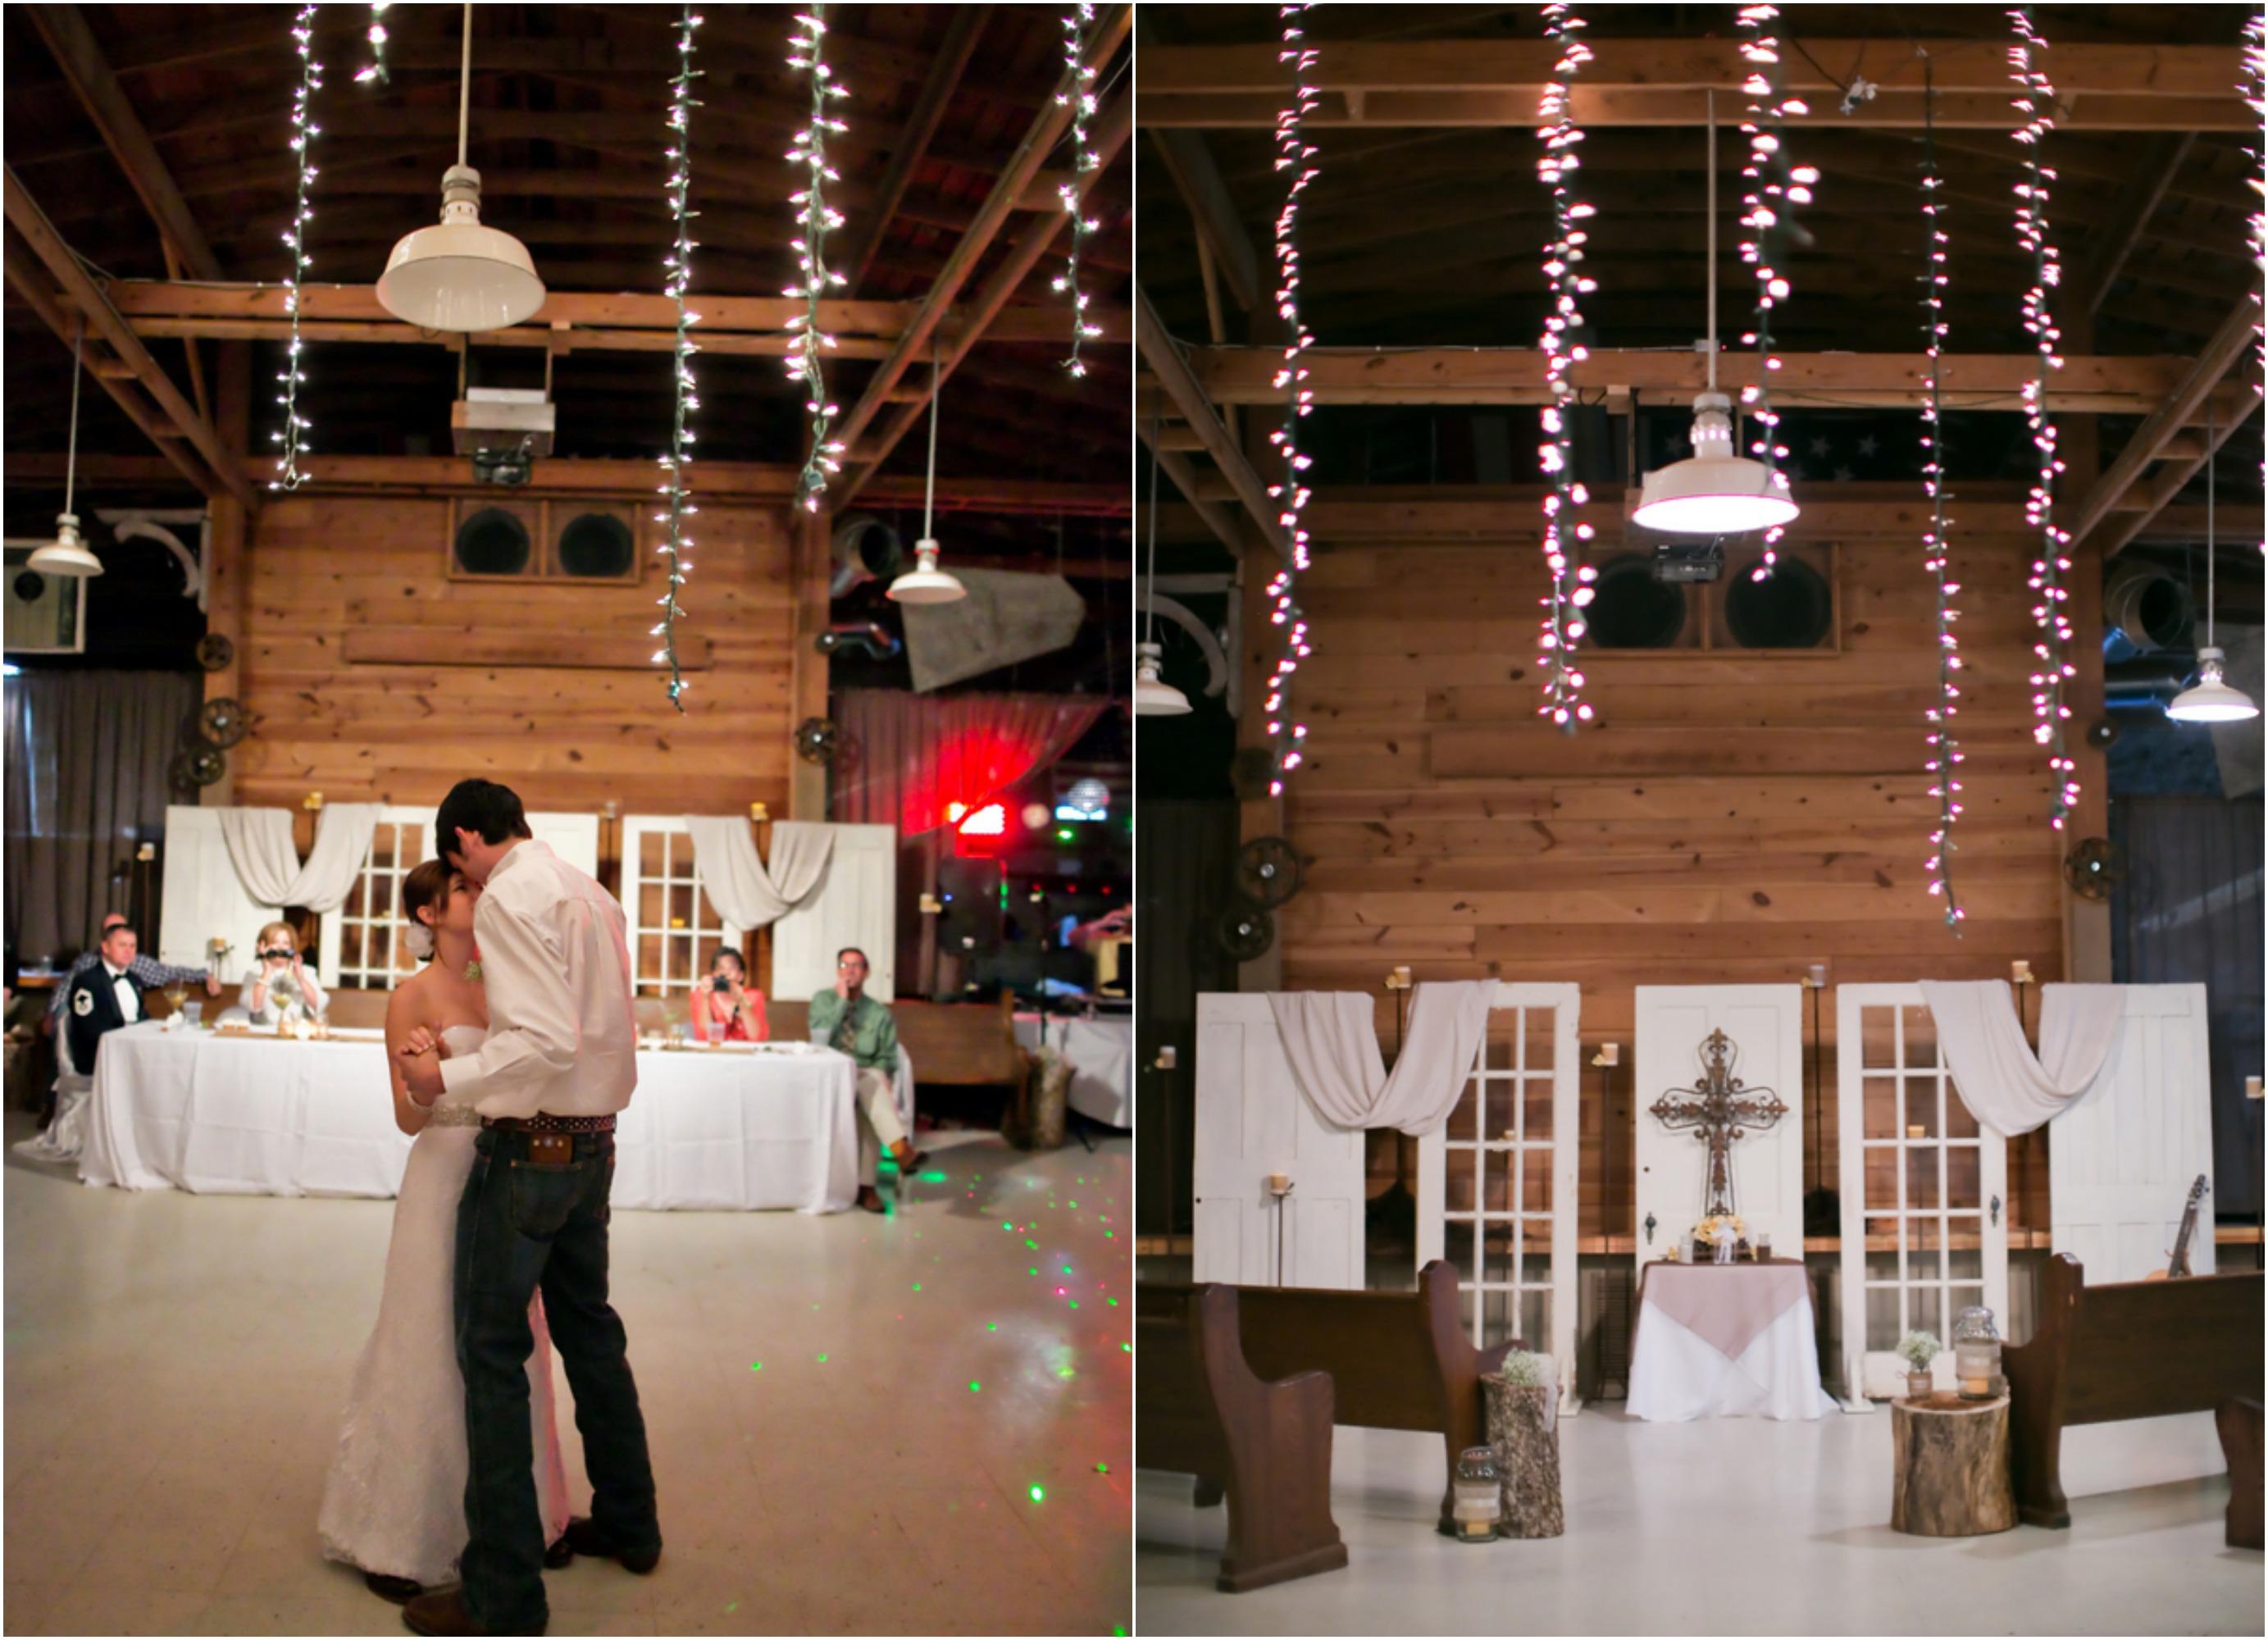 Texas Barn Wedding With Country Wedding Decorations